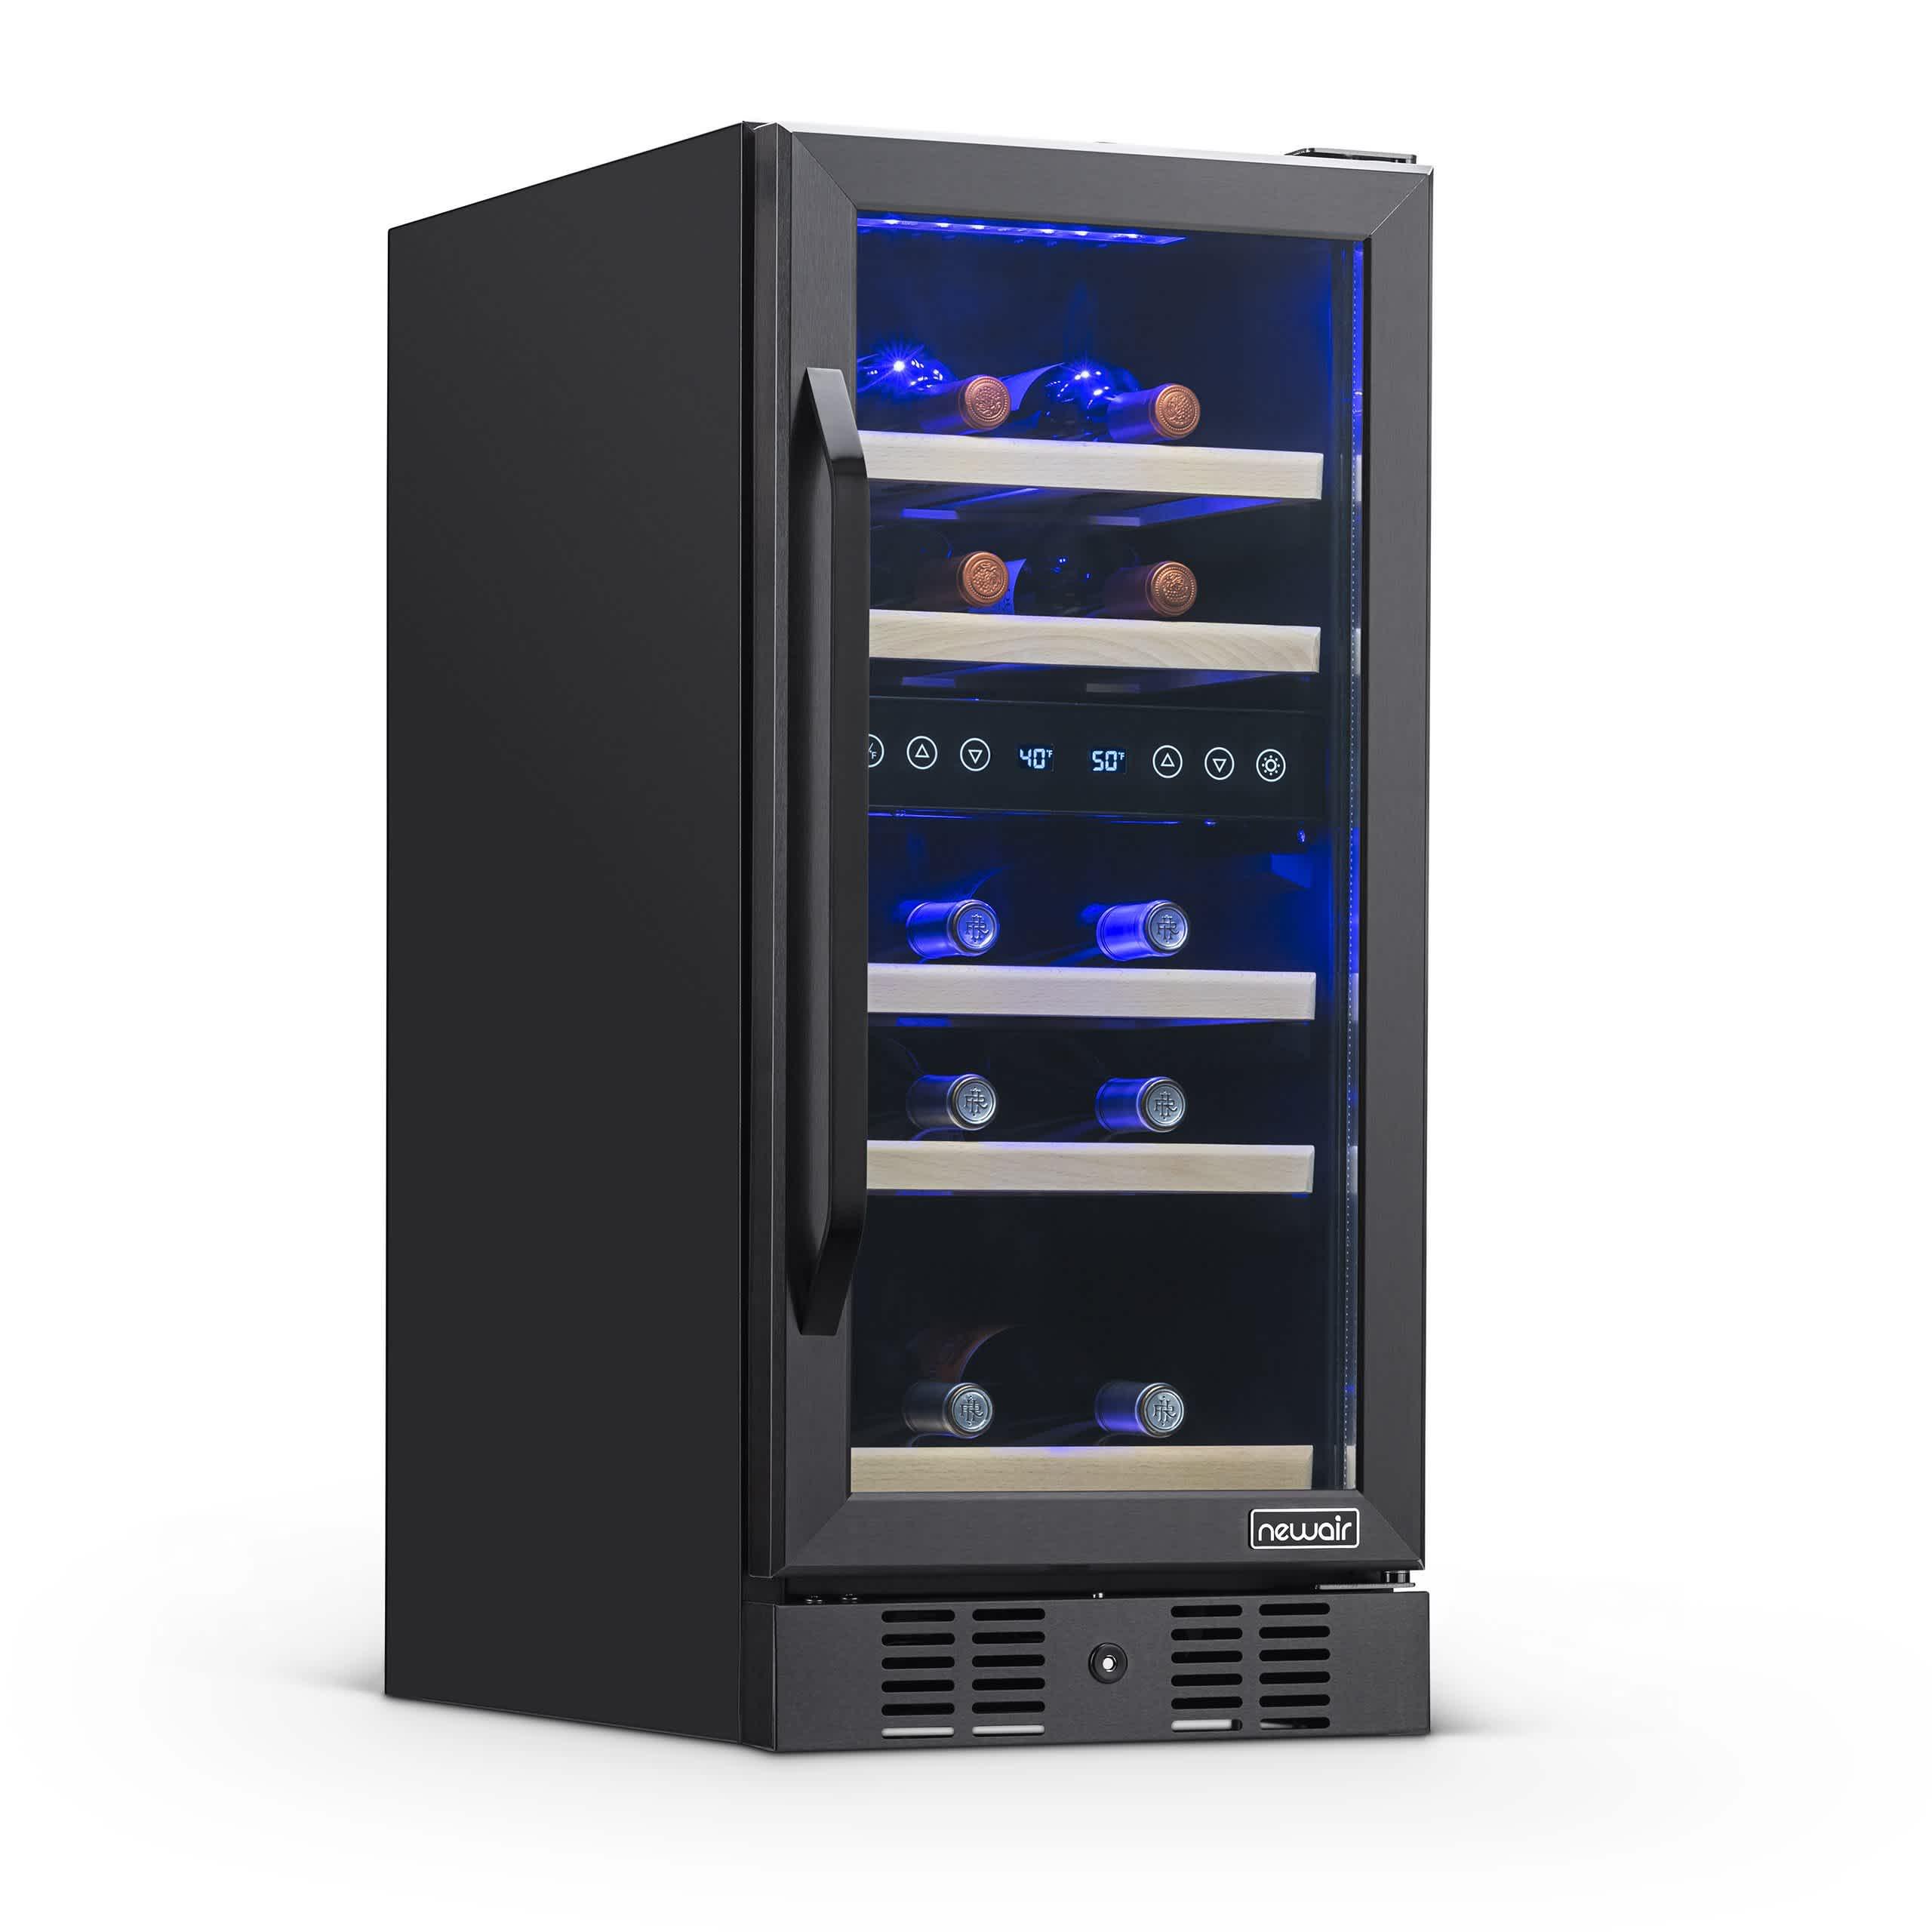 NewAir 15 inch Built-in 29 Bottle Dual Zone Wine Fridge in Black Stainless Steel